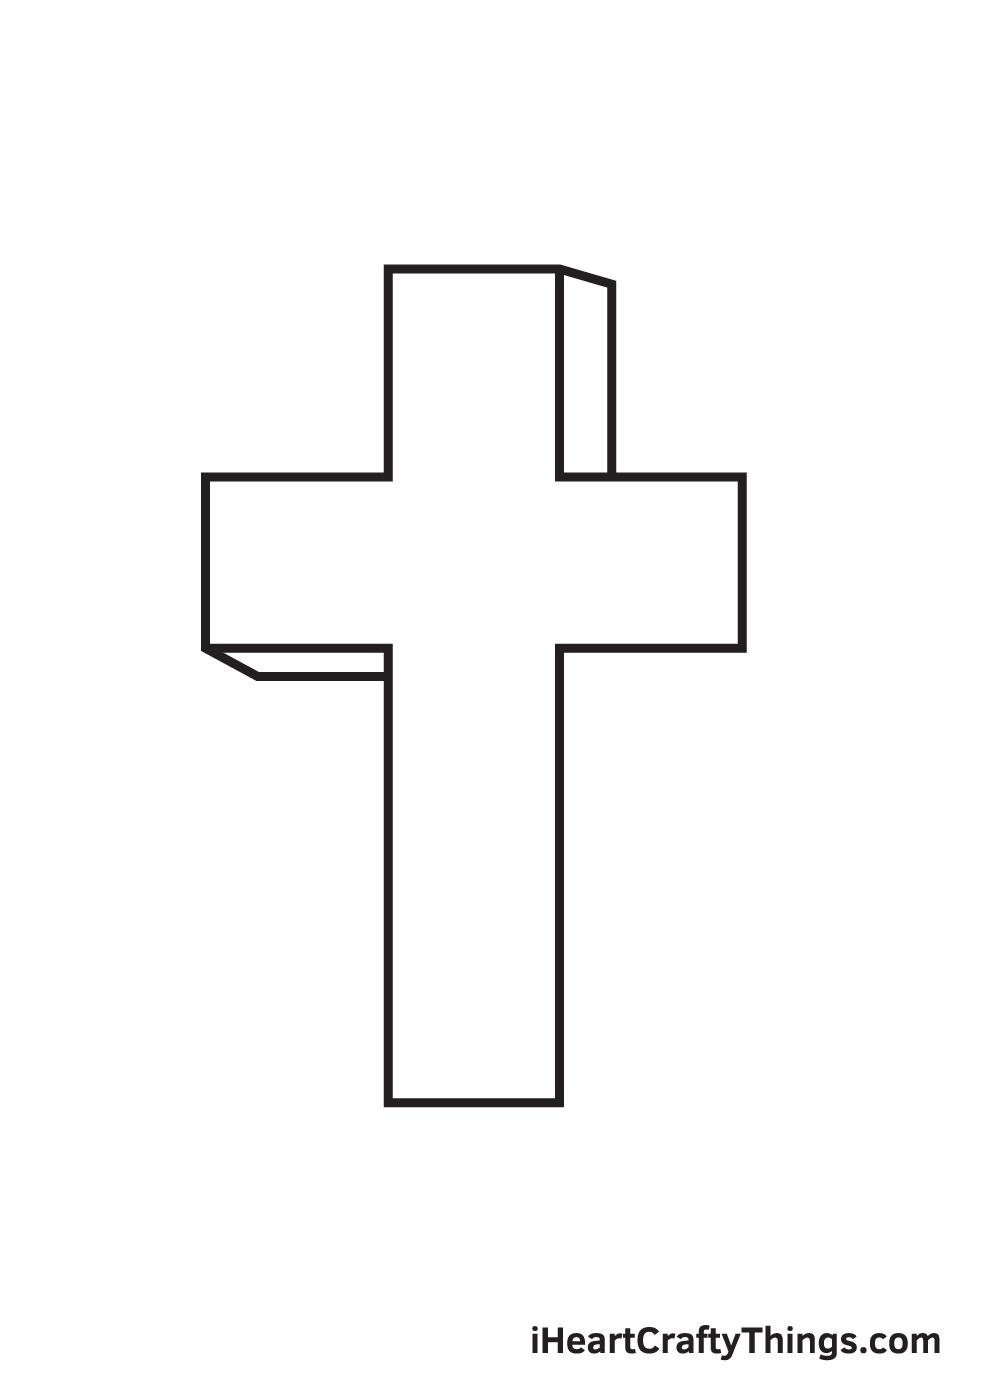 cross drawing - step 7